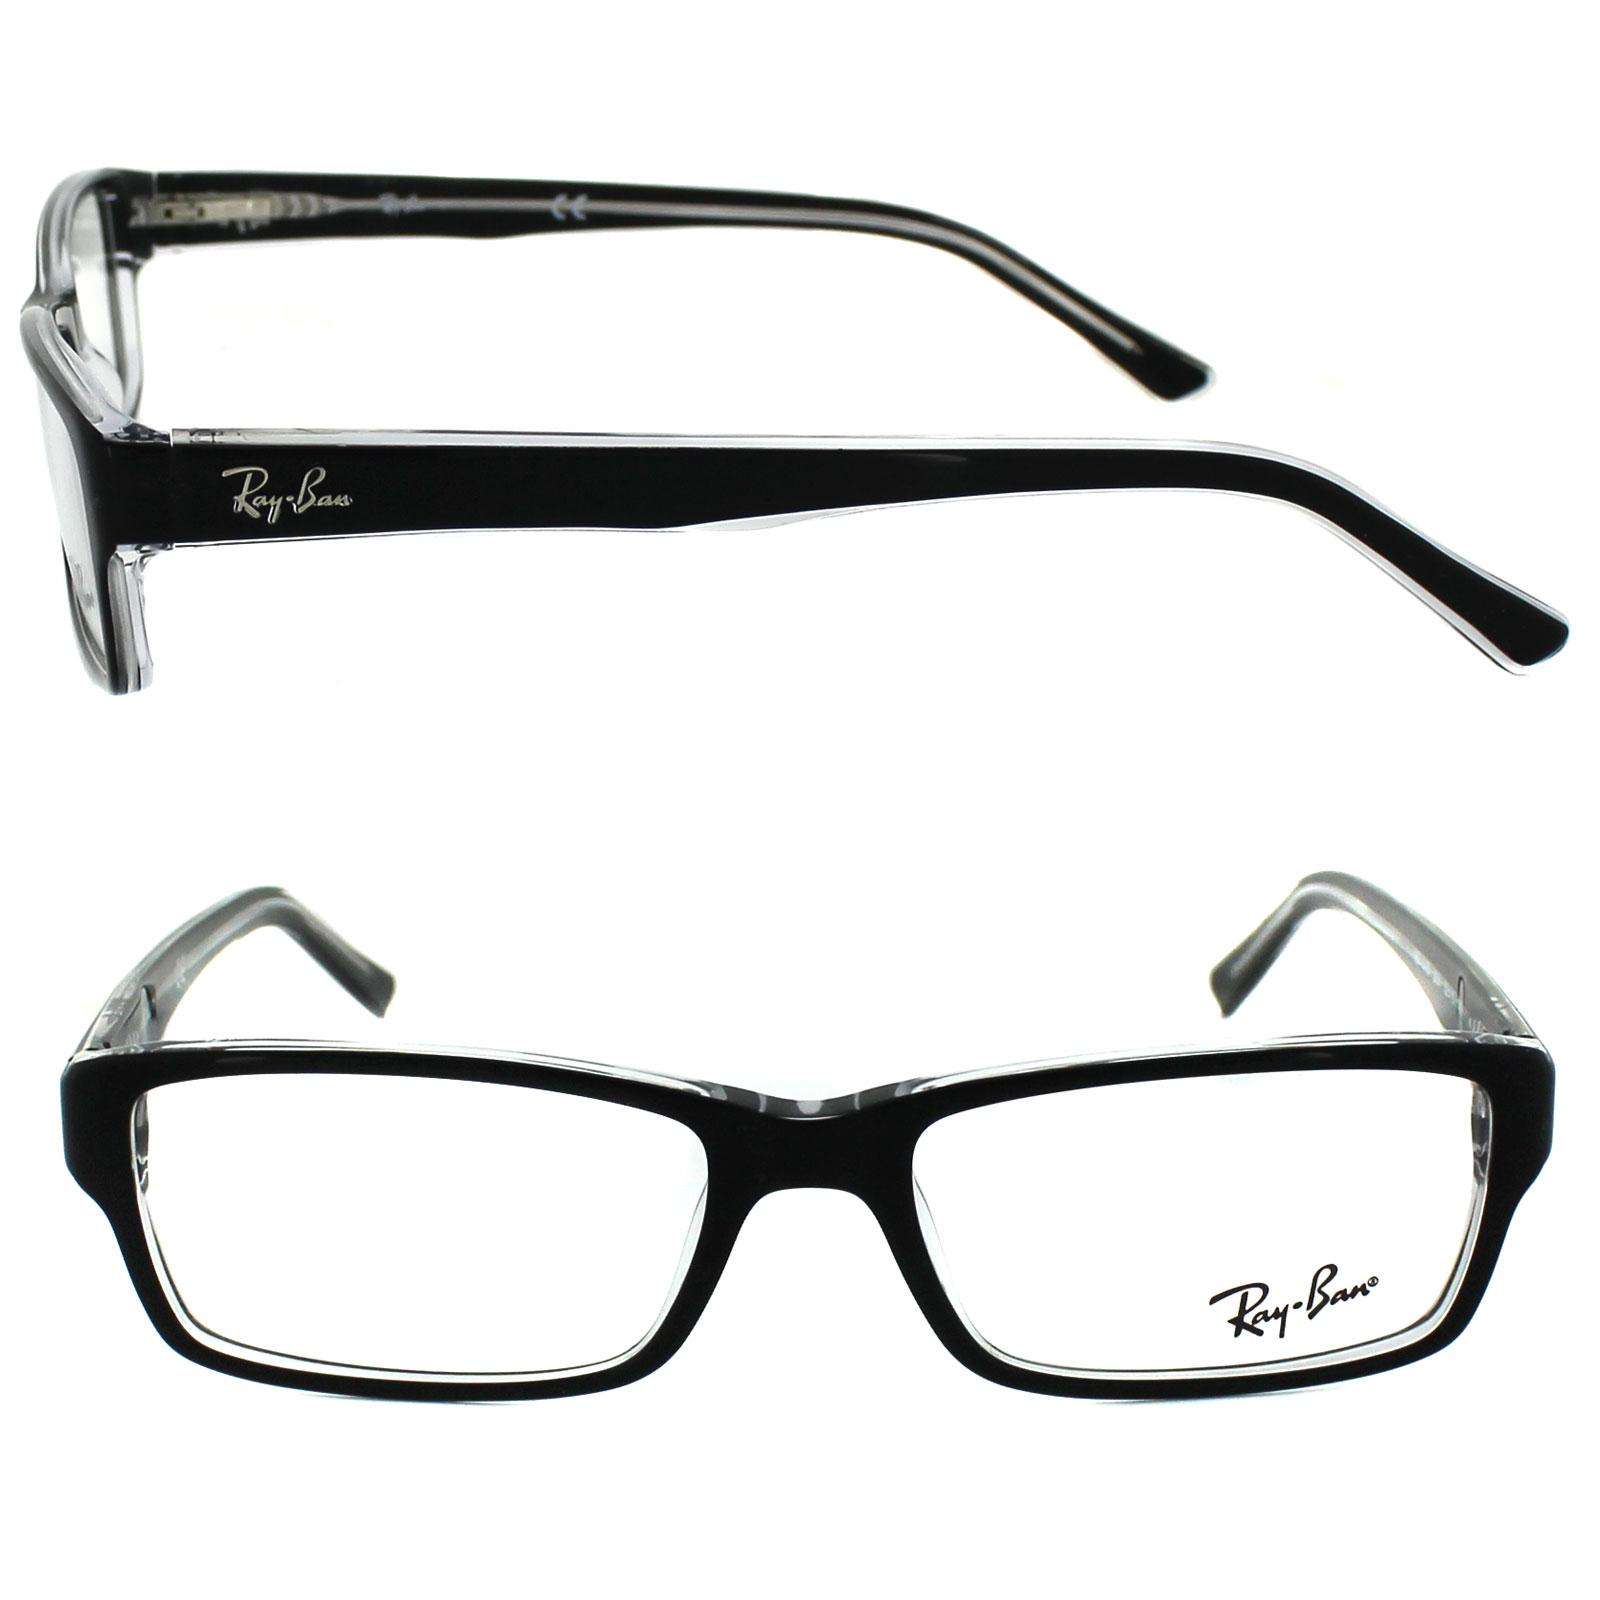 Ray Ban Glasses Frames Top Black On Transparent